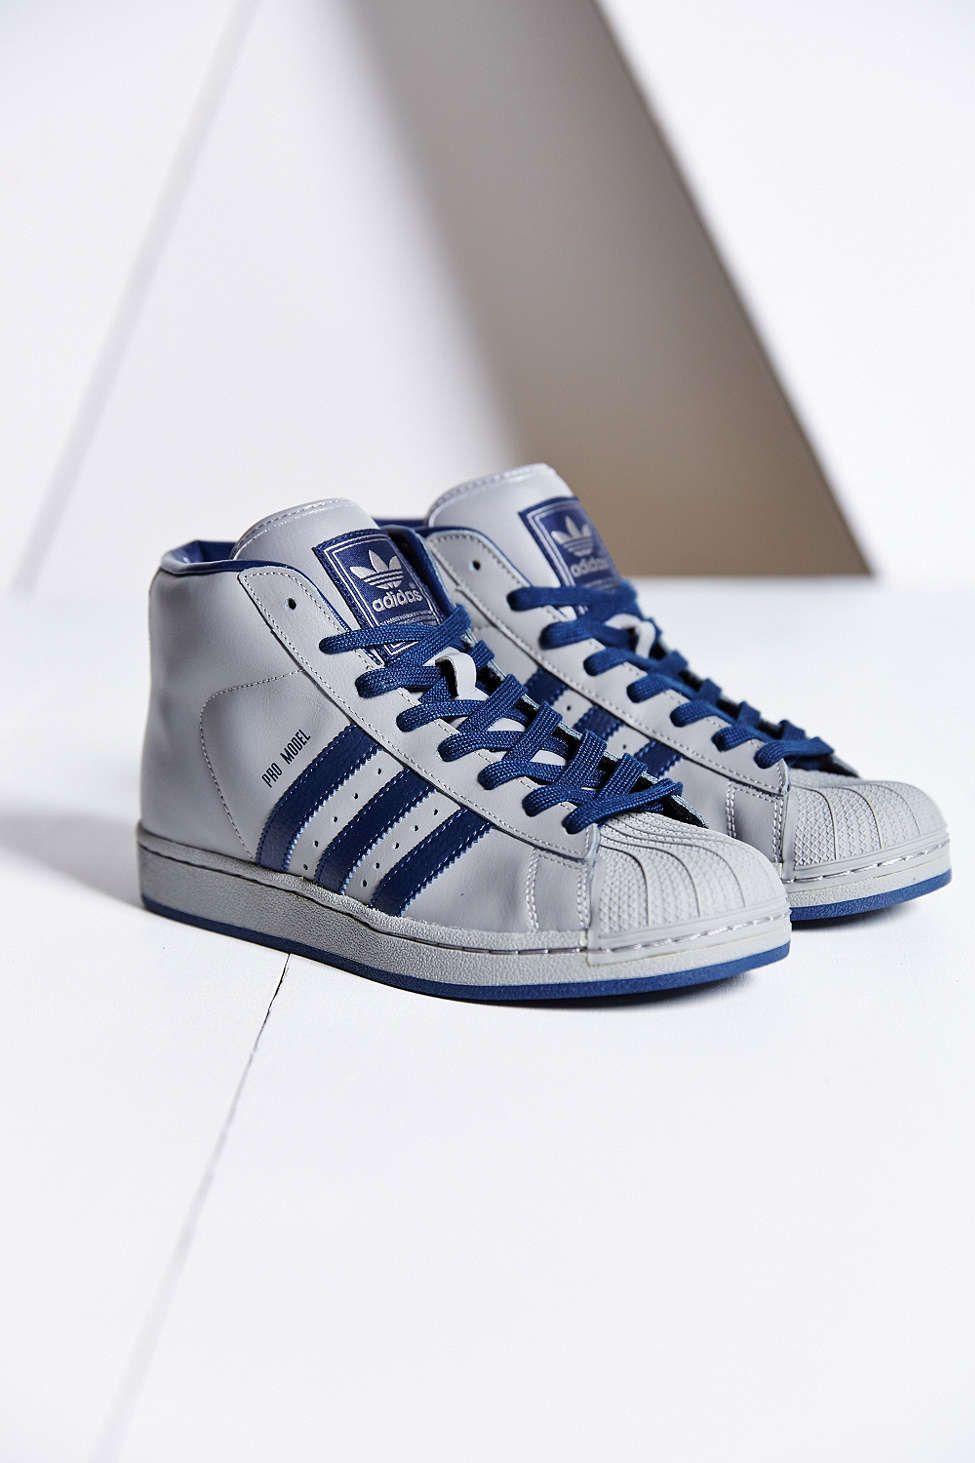 joyería Júnior sabio  adidas Originals Pro Model Sneaker | Sneakers, Womens sneakers, Adidas